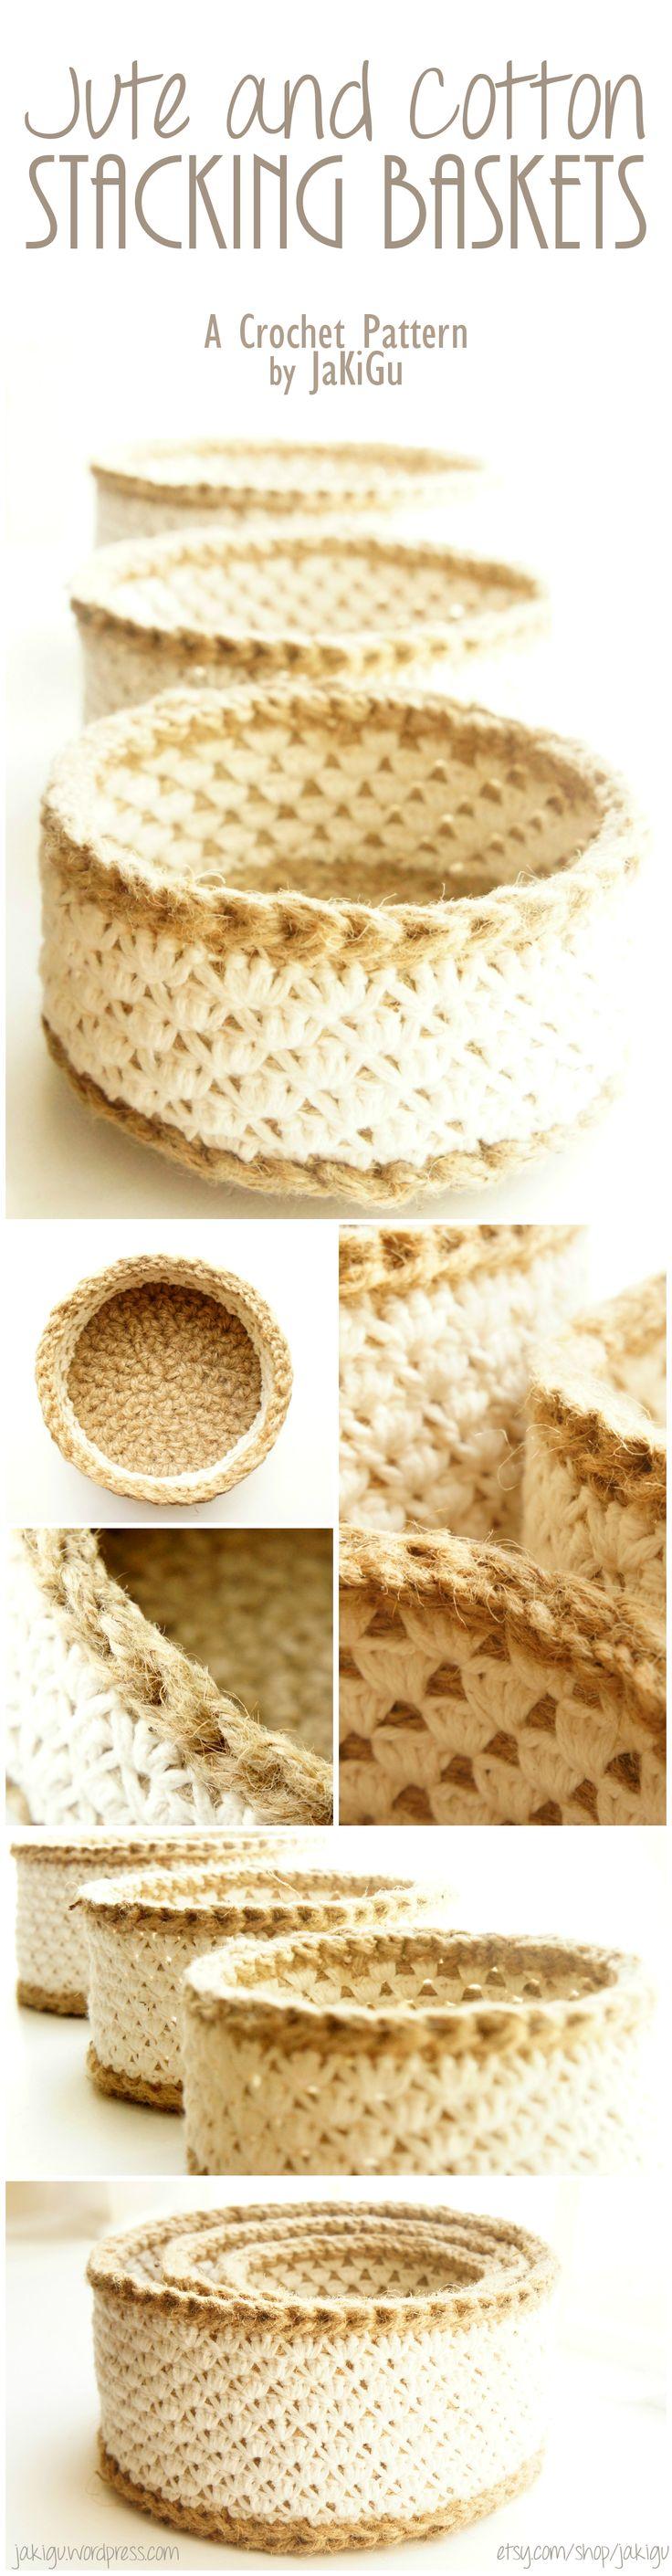 Stacking Crochet Baskets, a Pattern Designed by JaKiGu